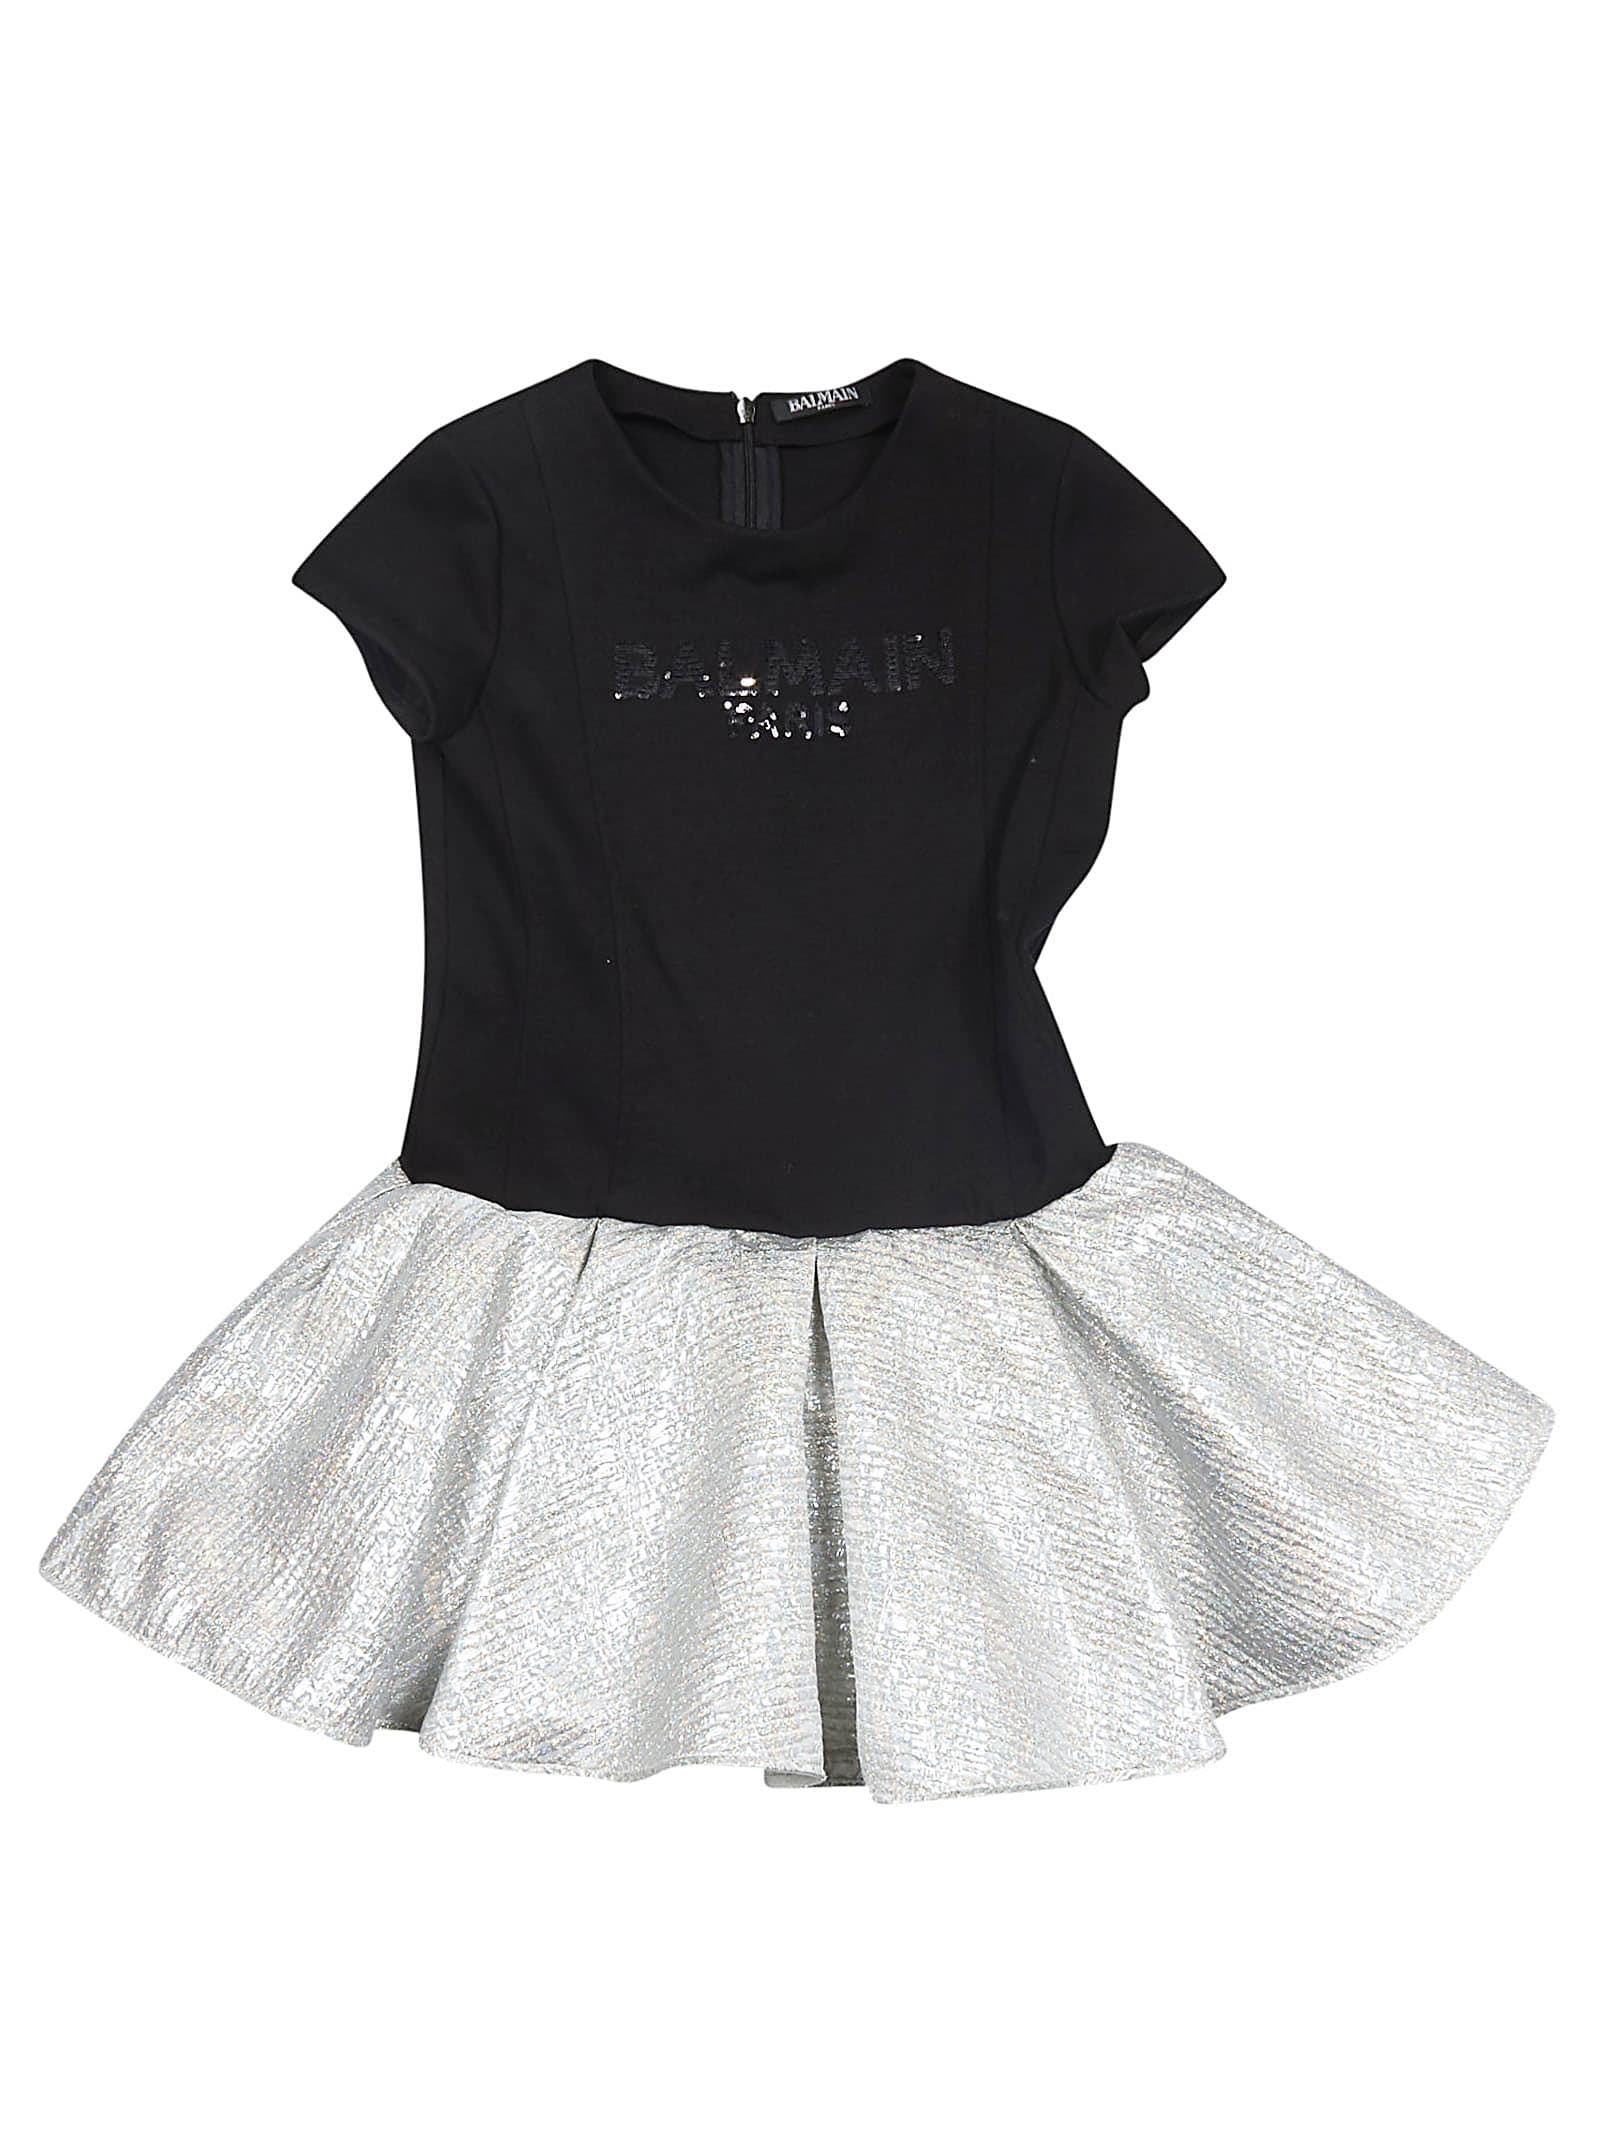 Balmain Kids Logo Dress